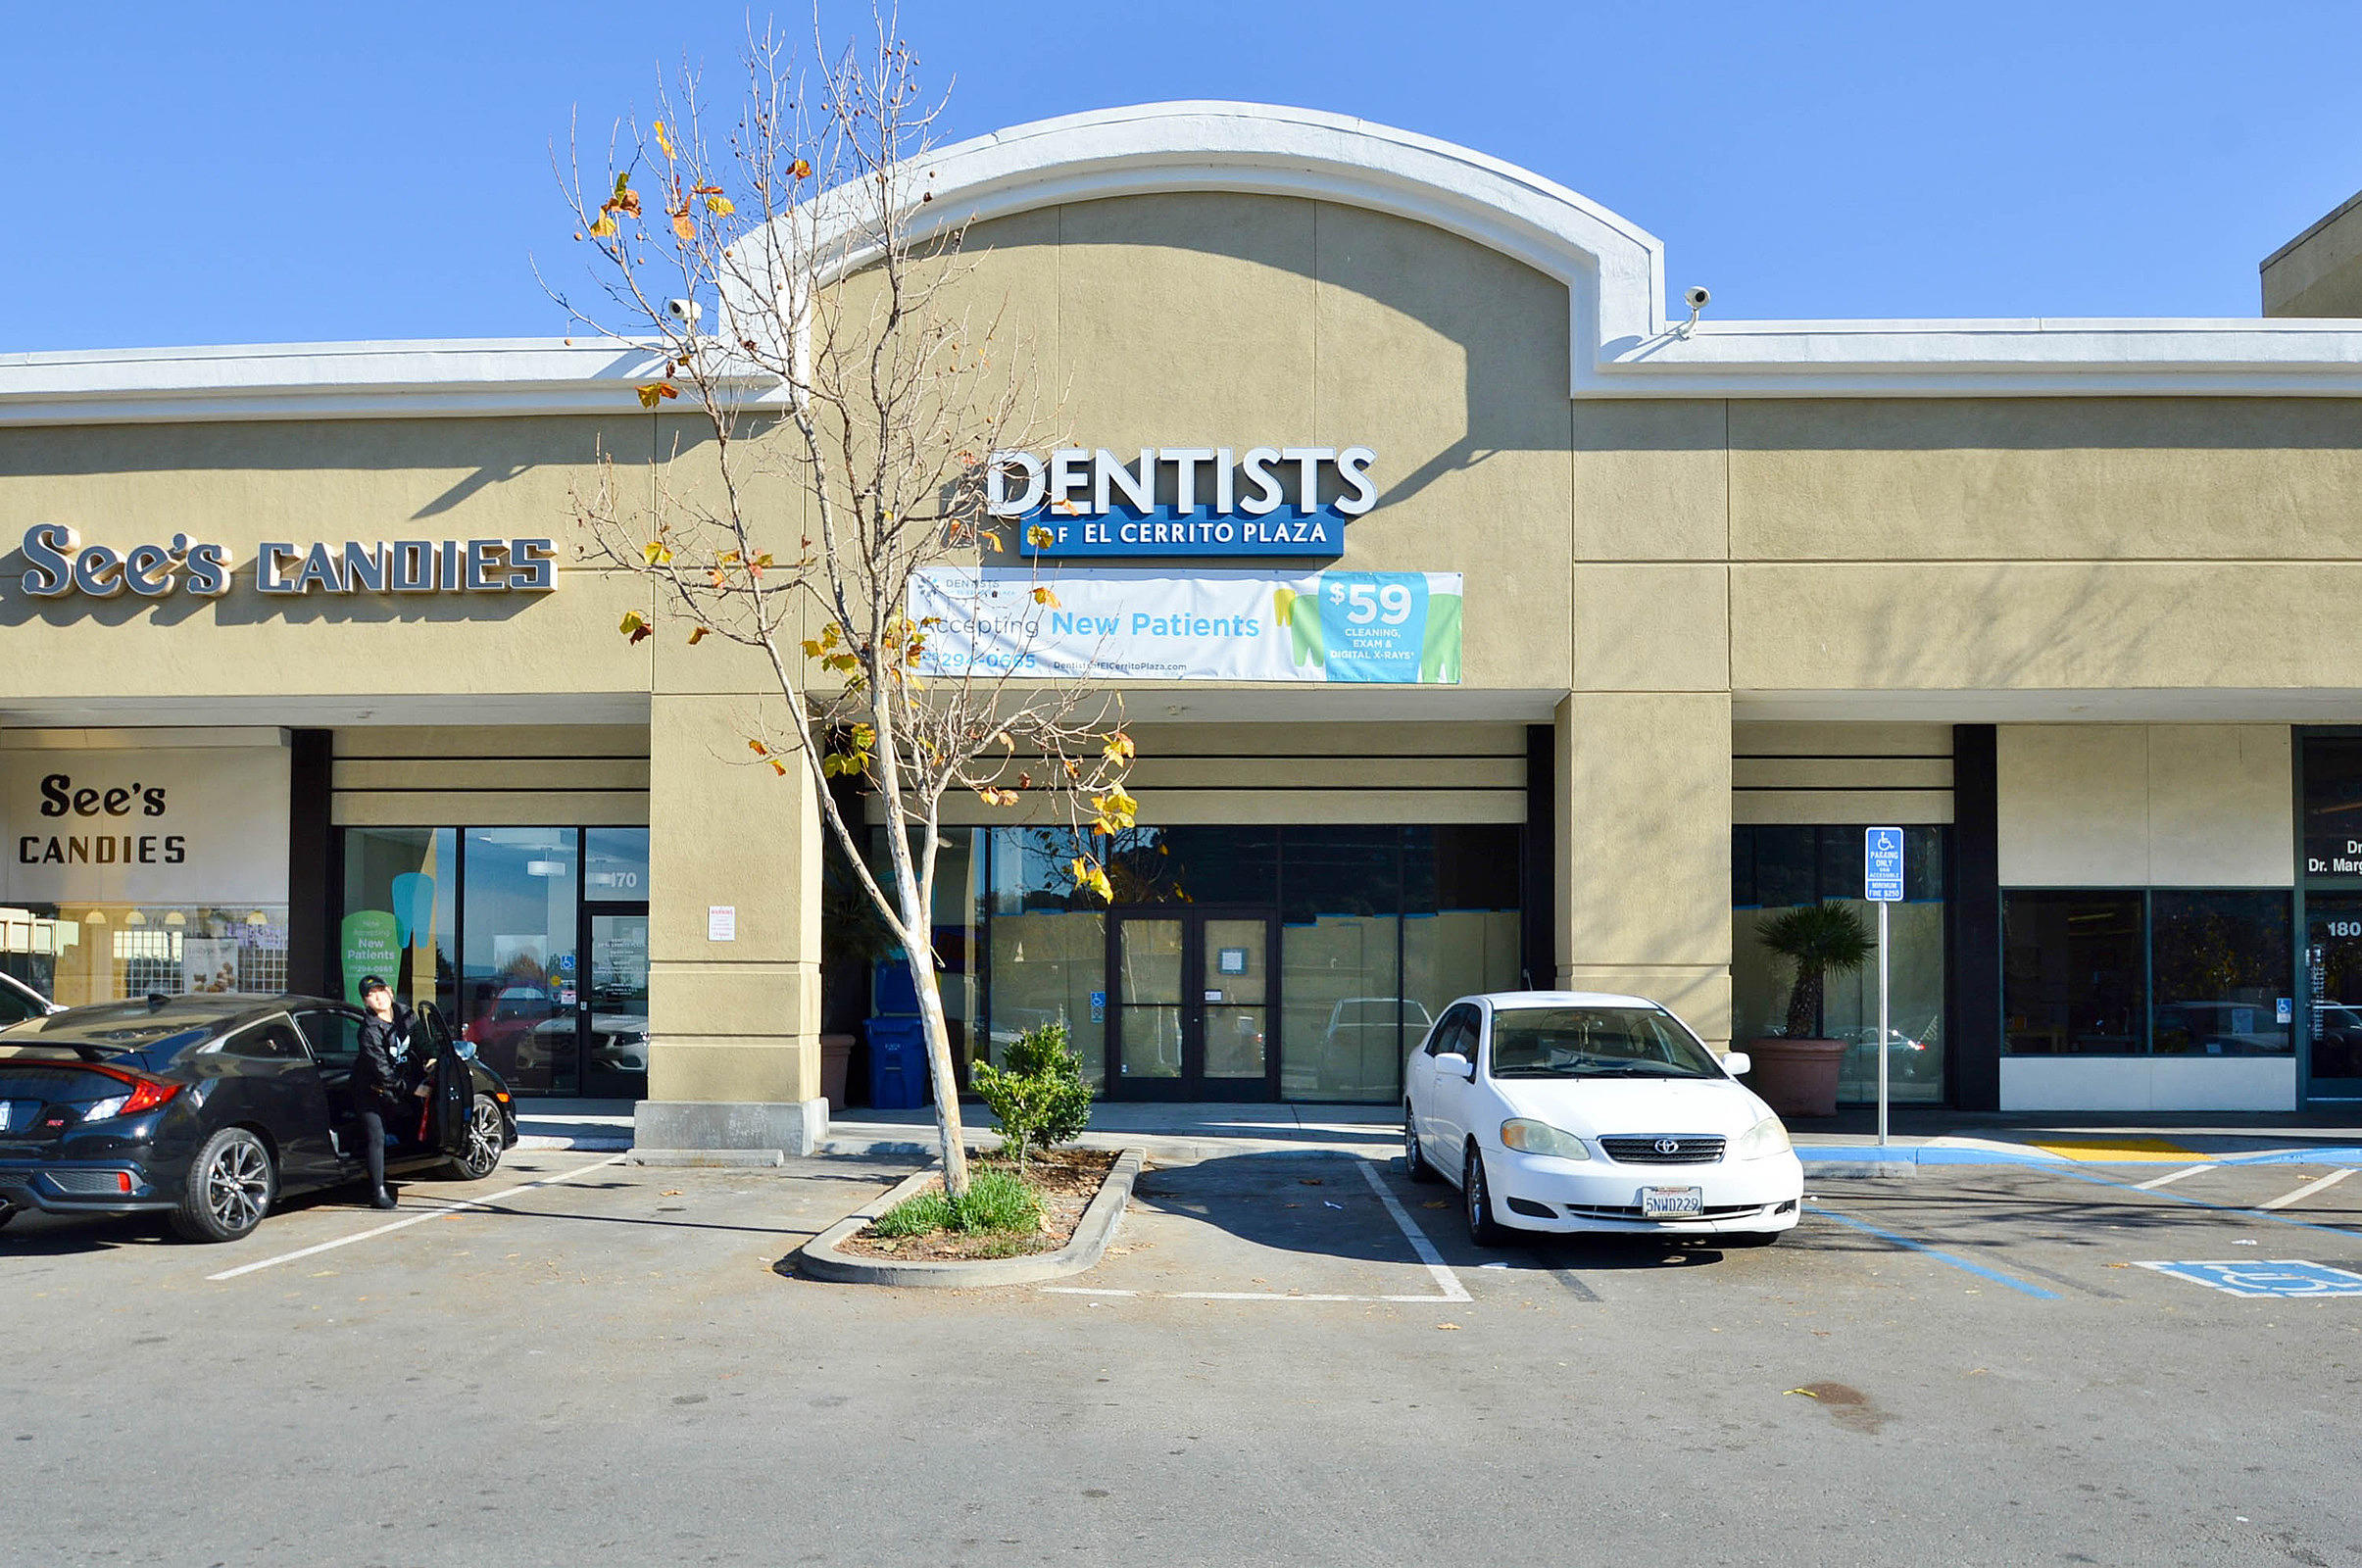 Dentists of El Cerrito Plaza image 0